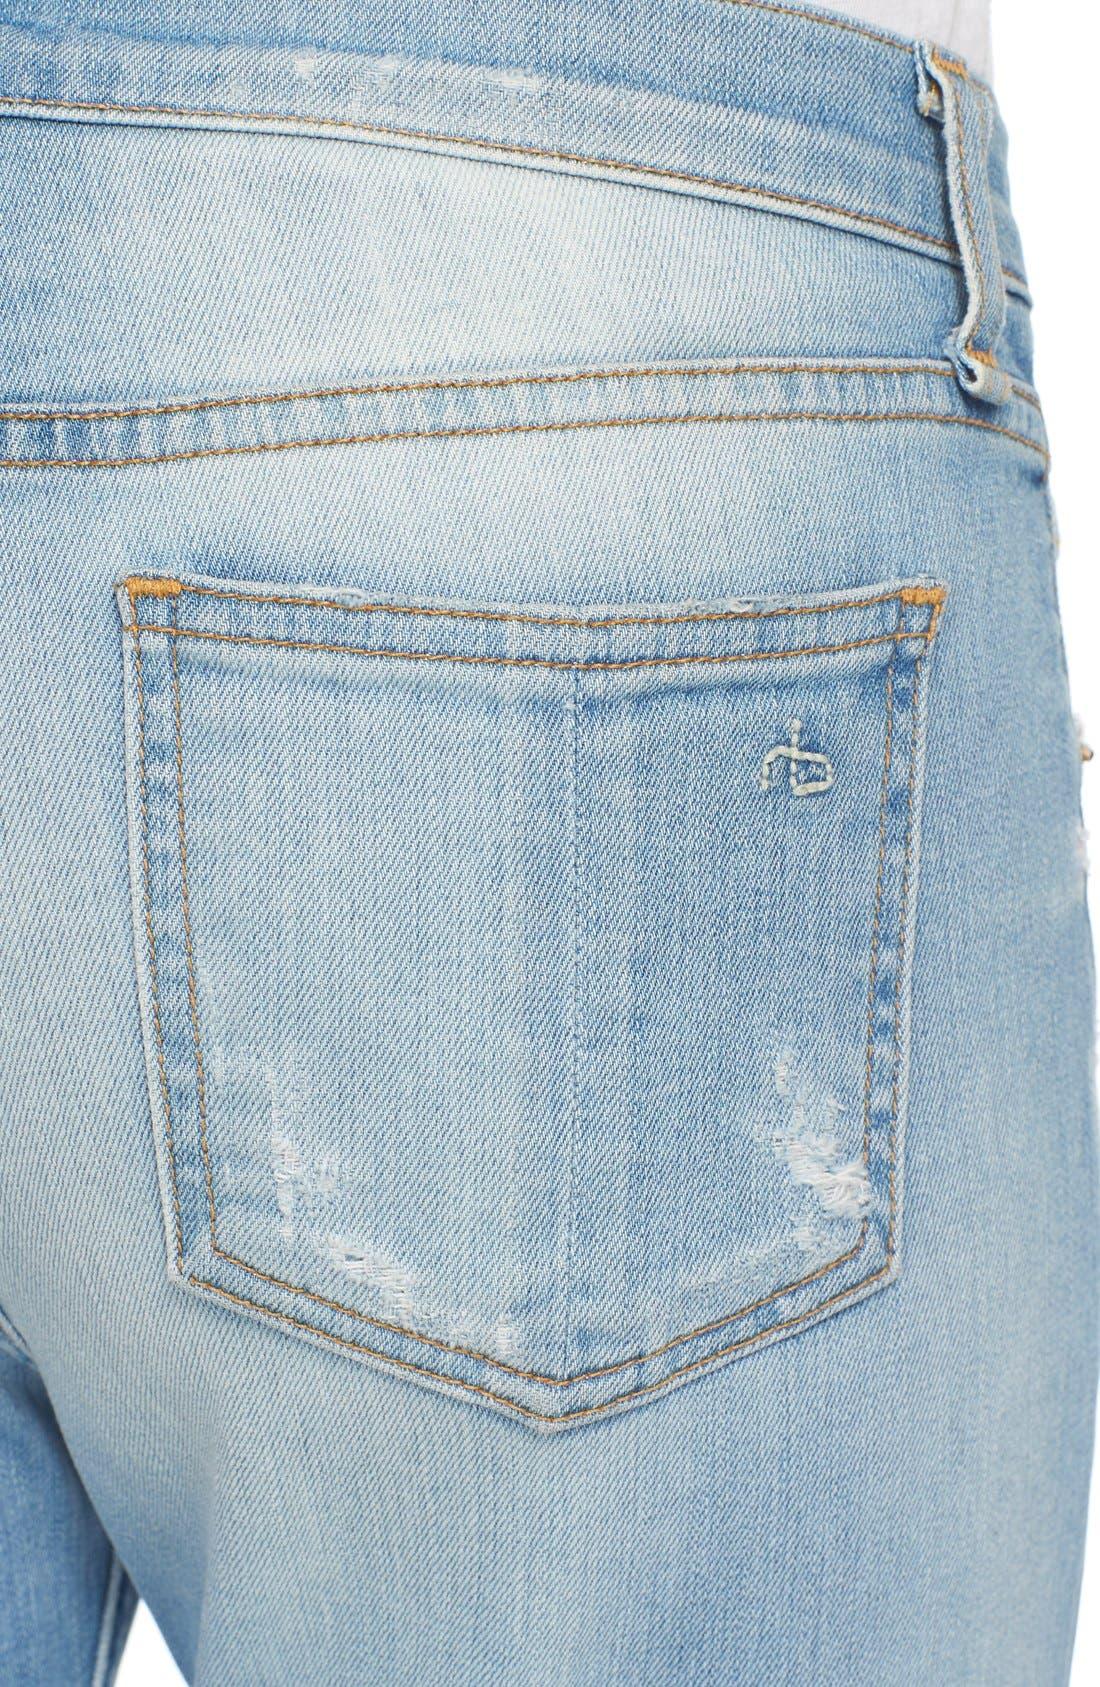 Alternate Image 4  - rag & bone/JEAN 'Beach' High Rise Bell Bottom Jeans (Ryder)